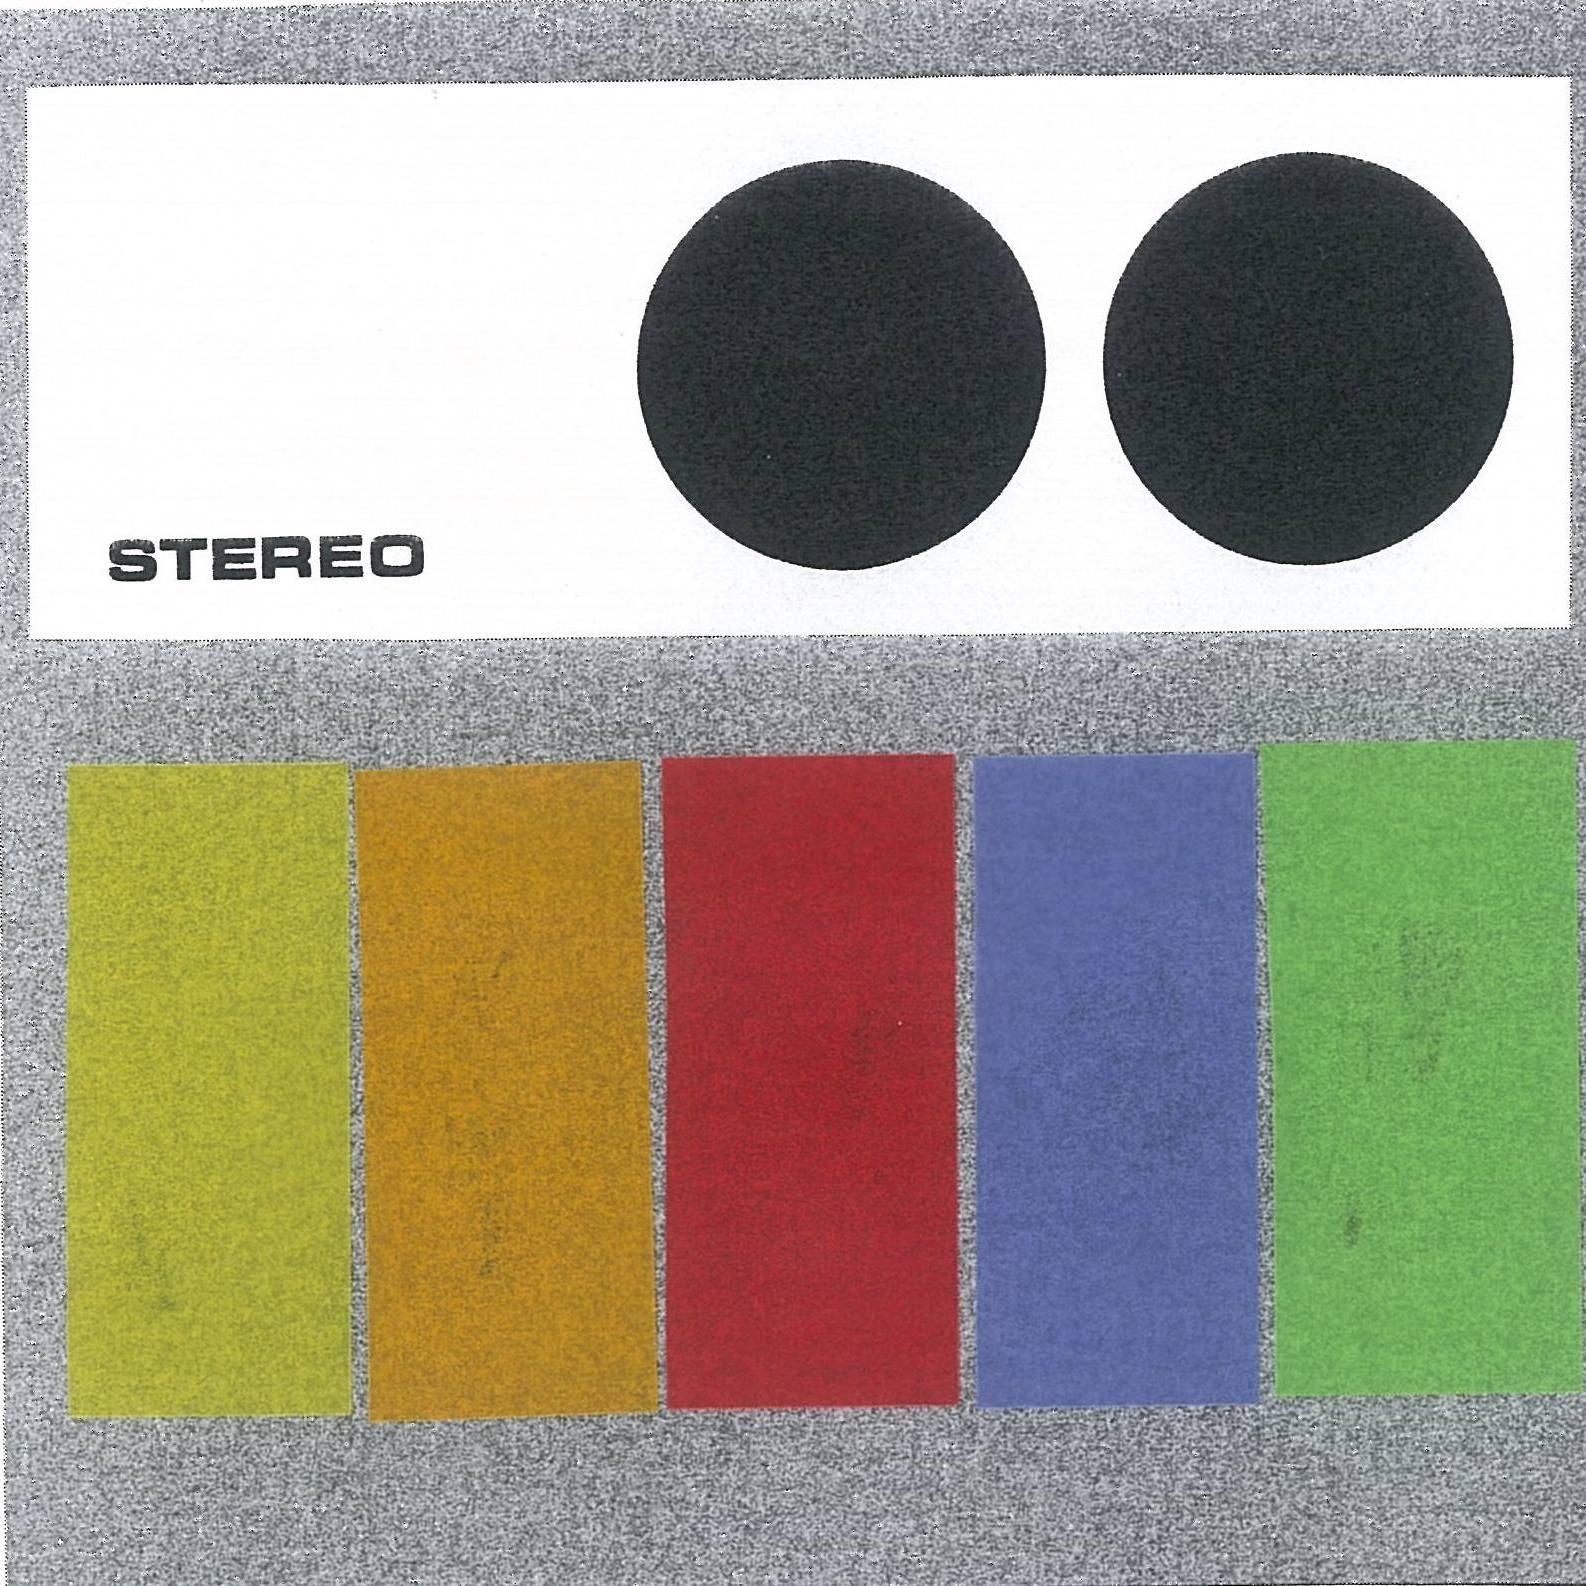 Stereo – Vinyl Culture Shop